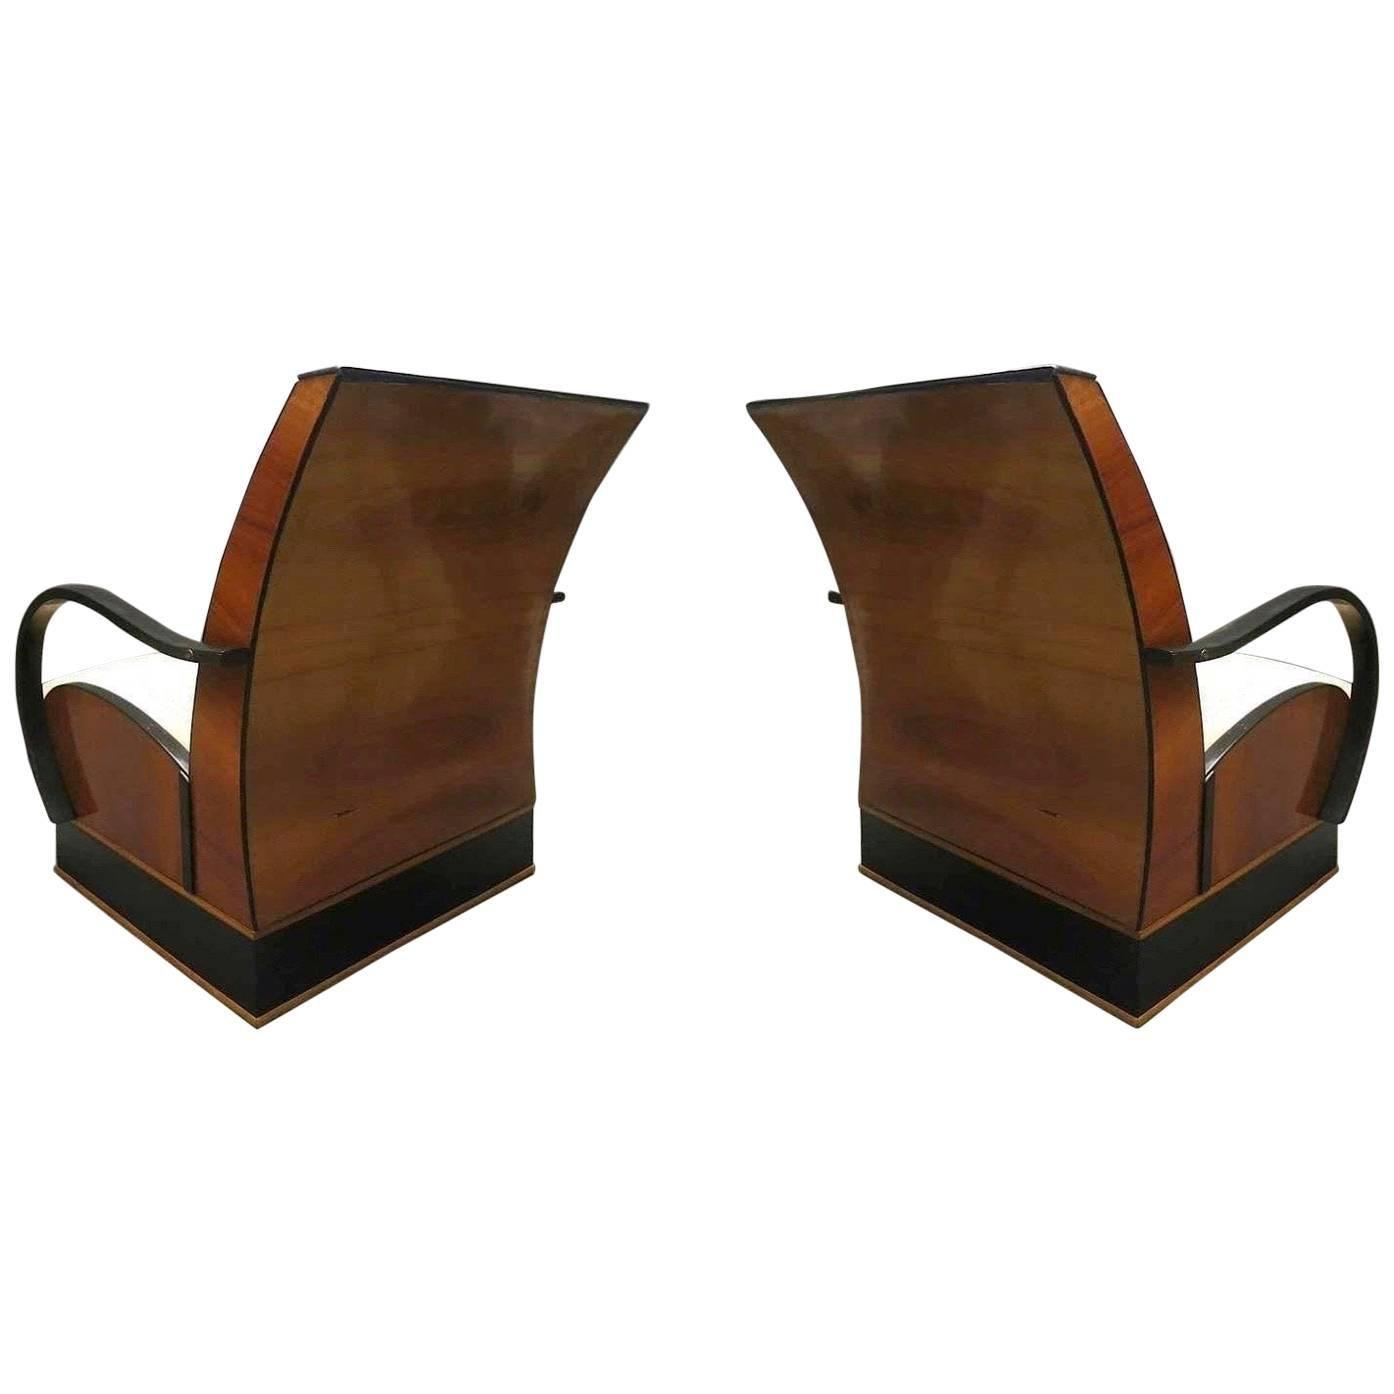 Pair of Art Deco Walnut Wood and Velvet Fabric Italian Armchairs, 1940